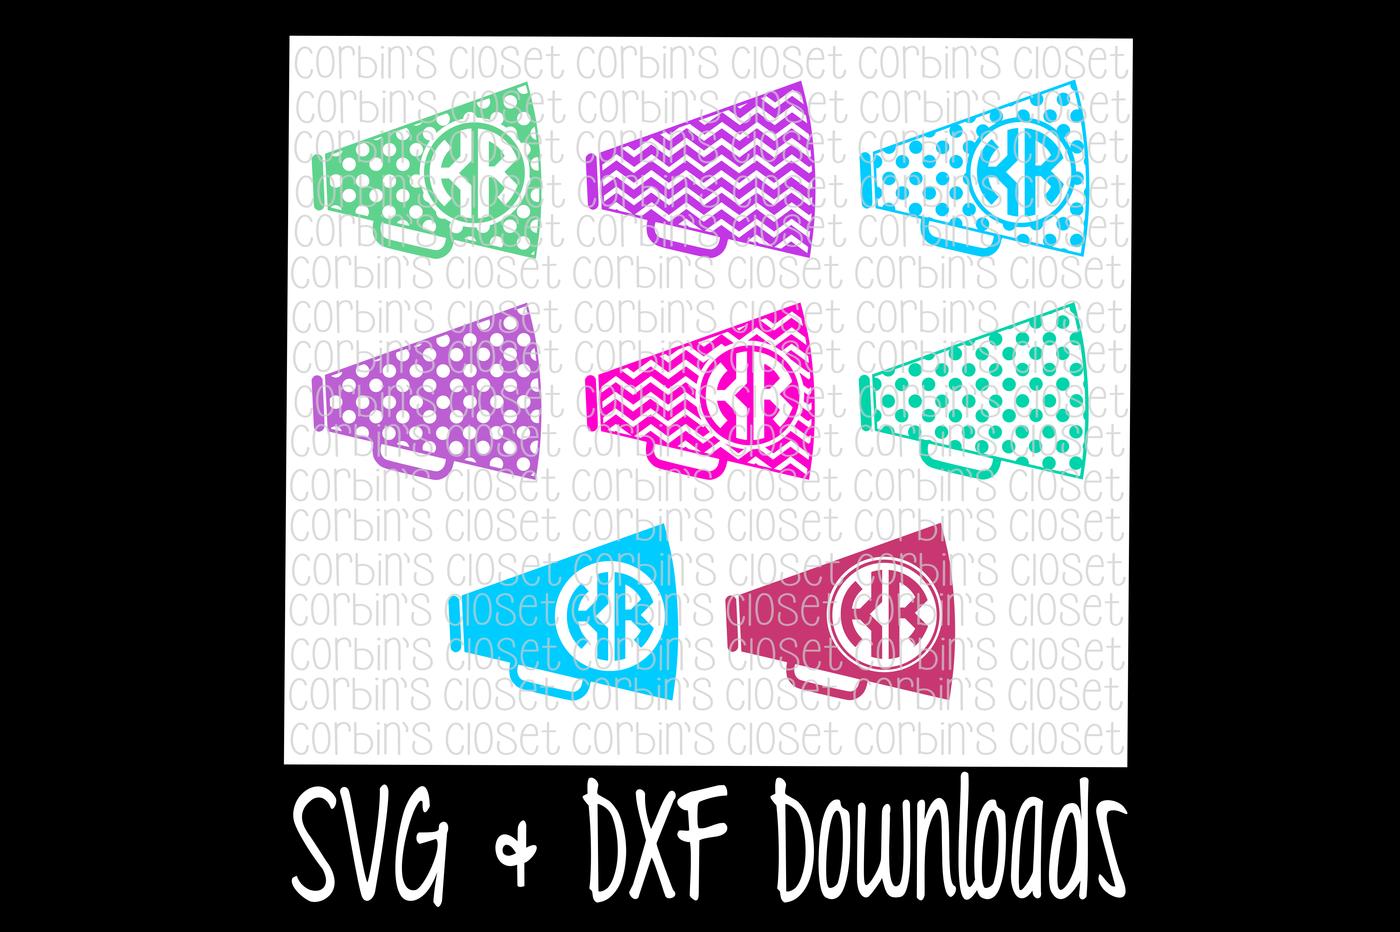 Cheer Svg Cheer Monogram Svg Megaphone Cut File By Corbins Svg Thehungryjpeg Com